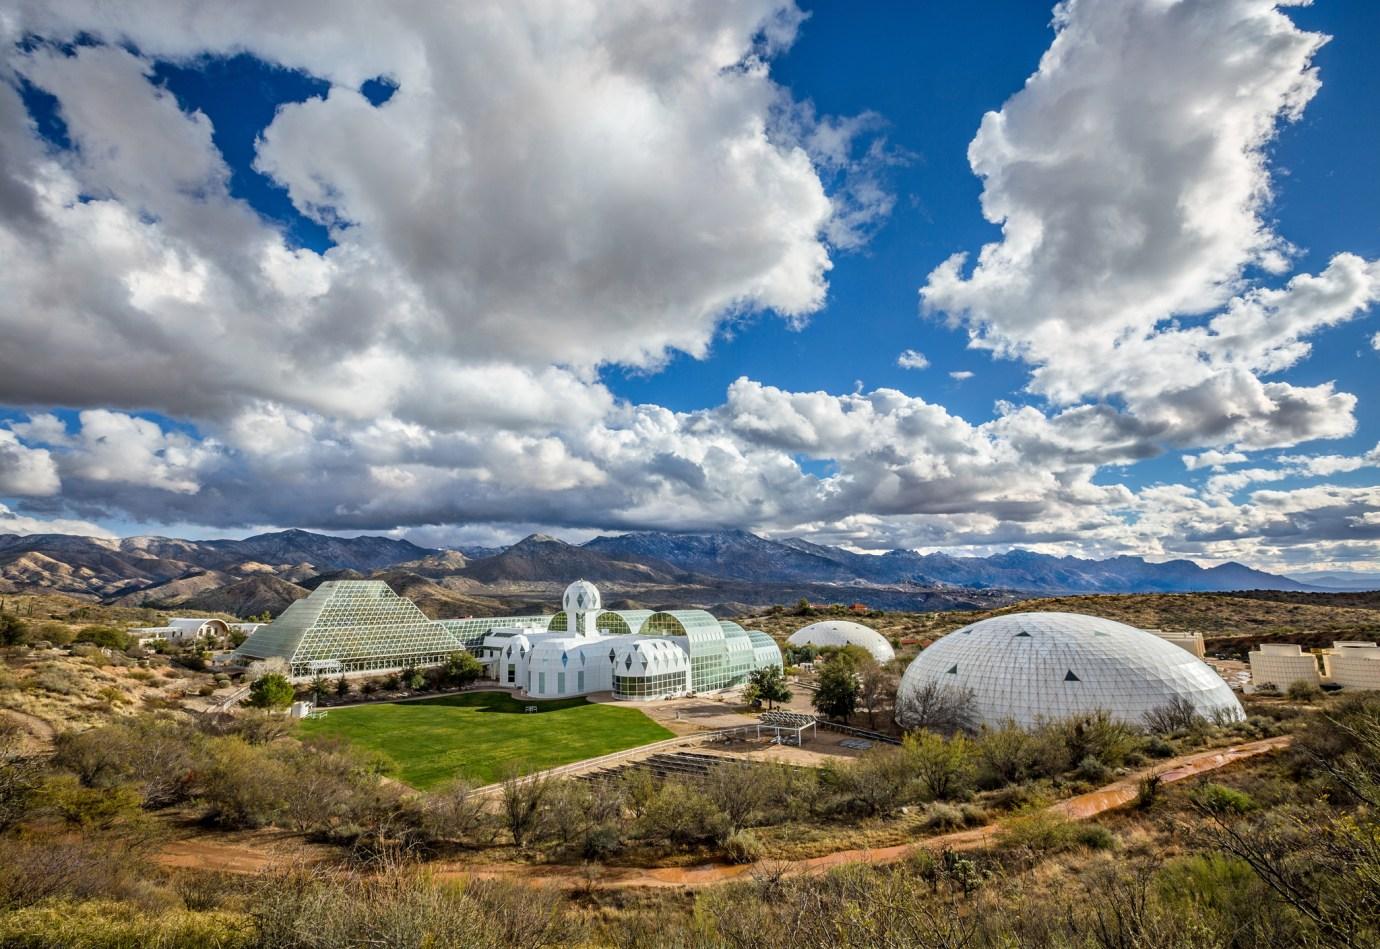 biosphere clouds